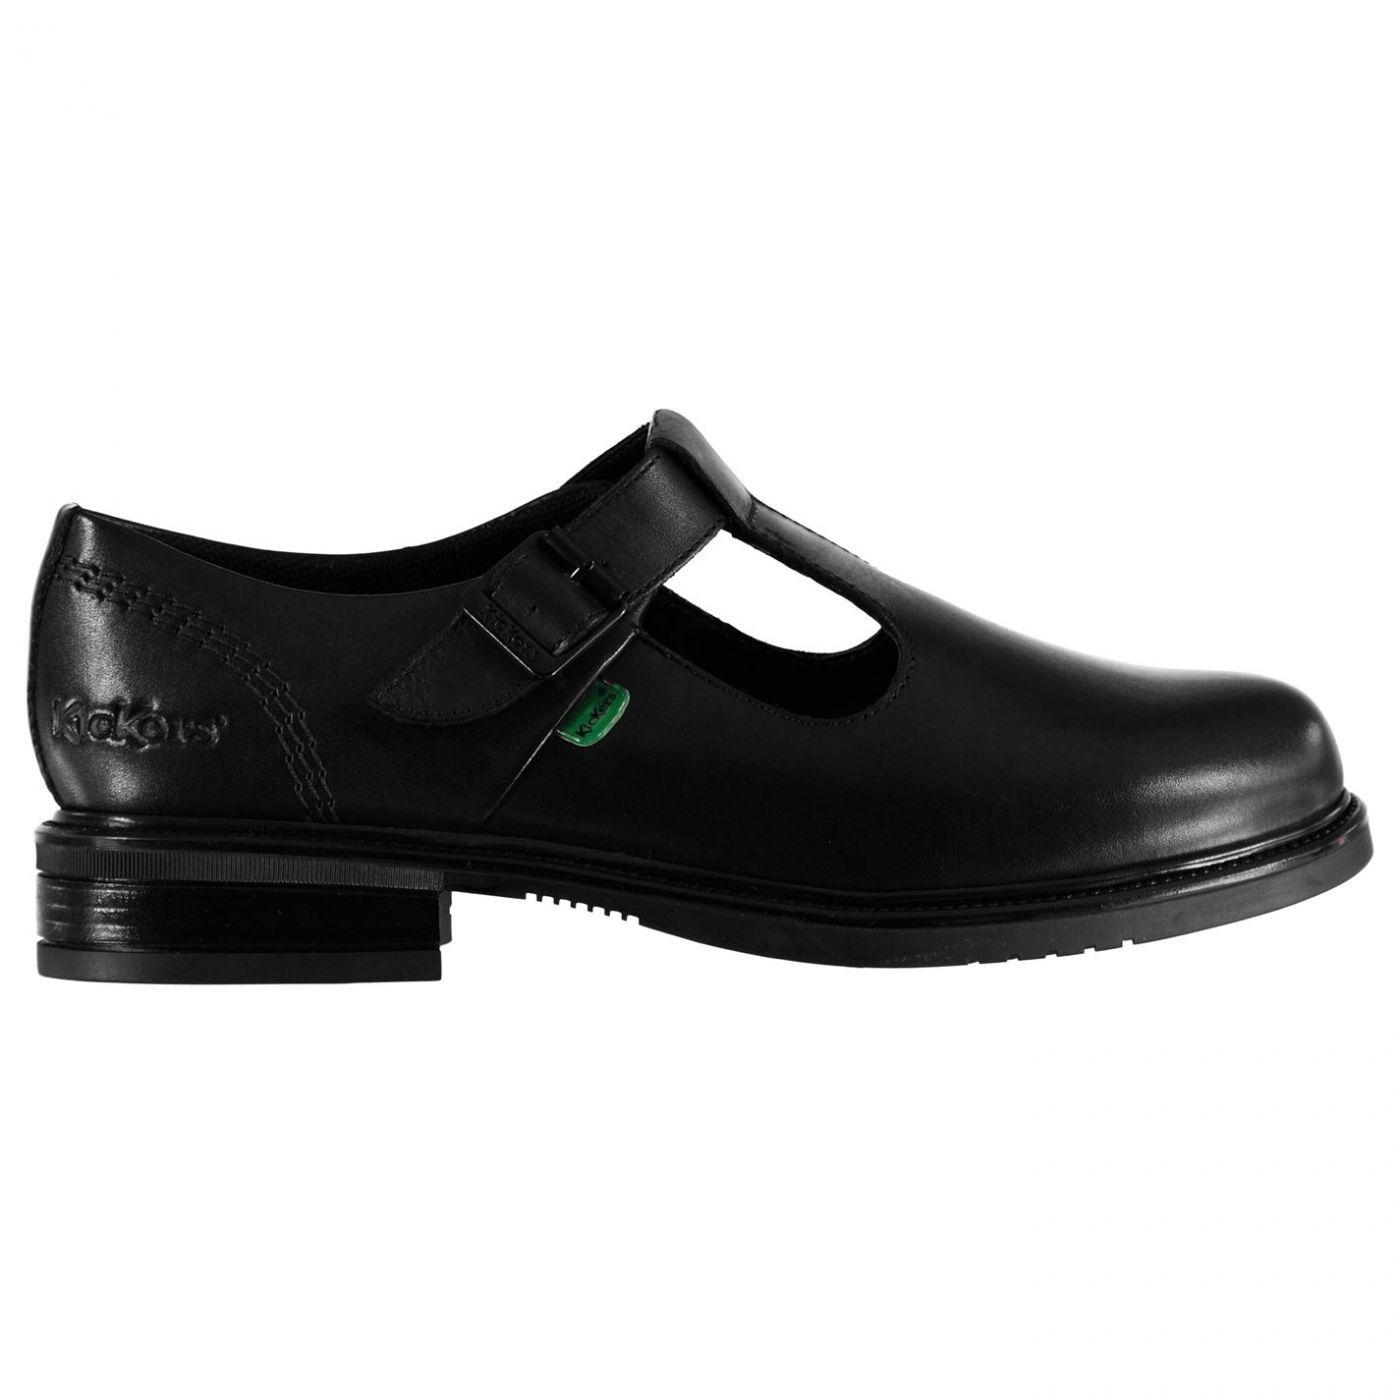 Kickers Lach TB MTO Mary Jane Shoes Ladies